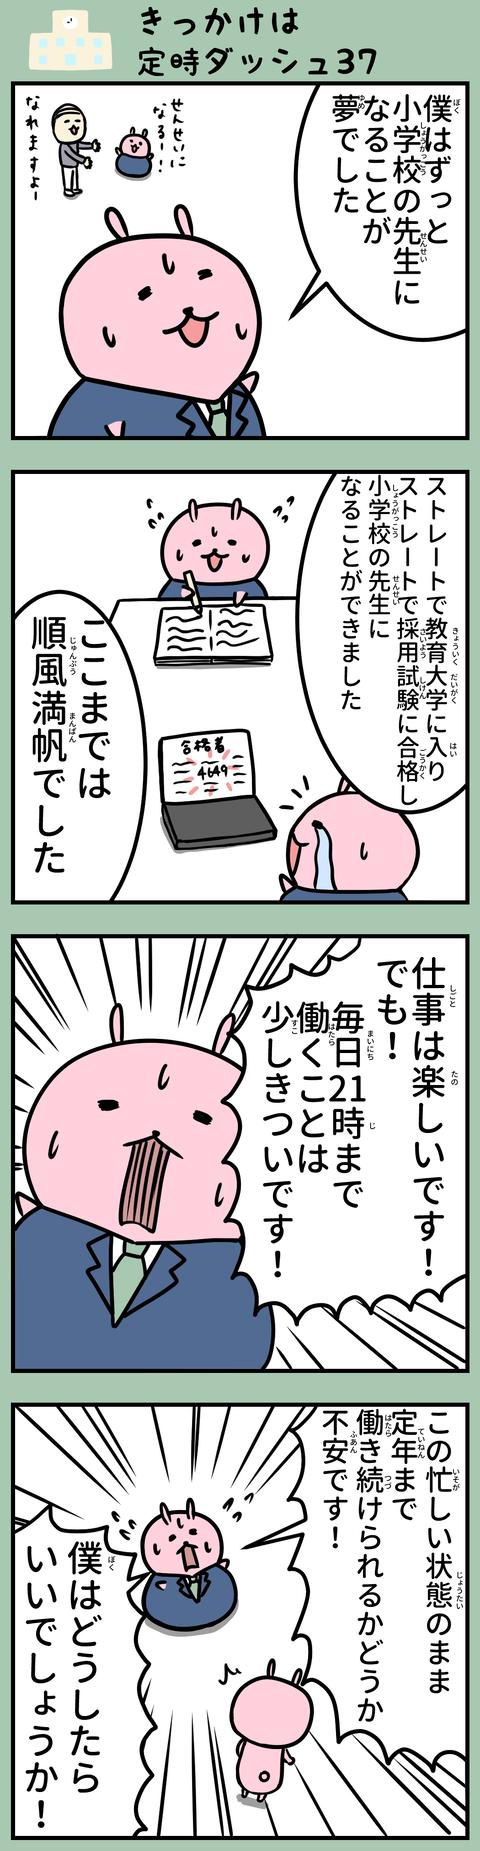 manga-yuzuporo105-1